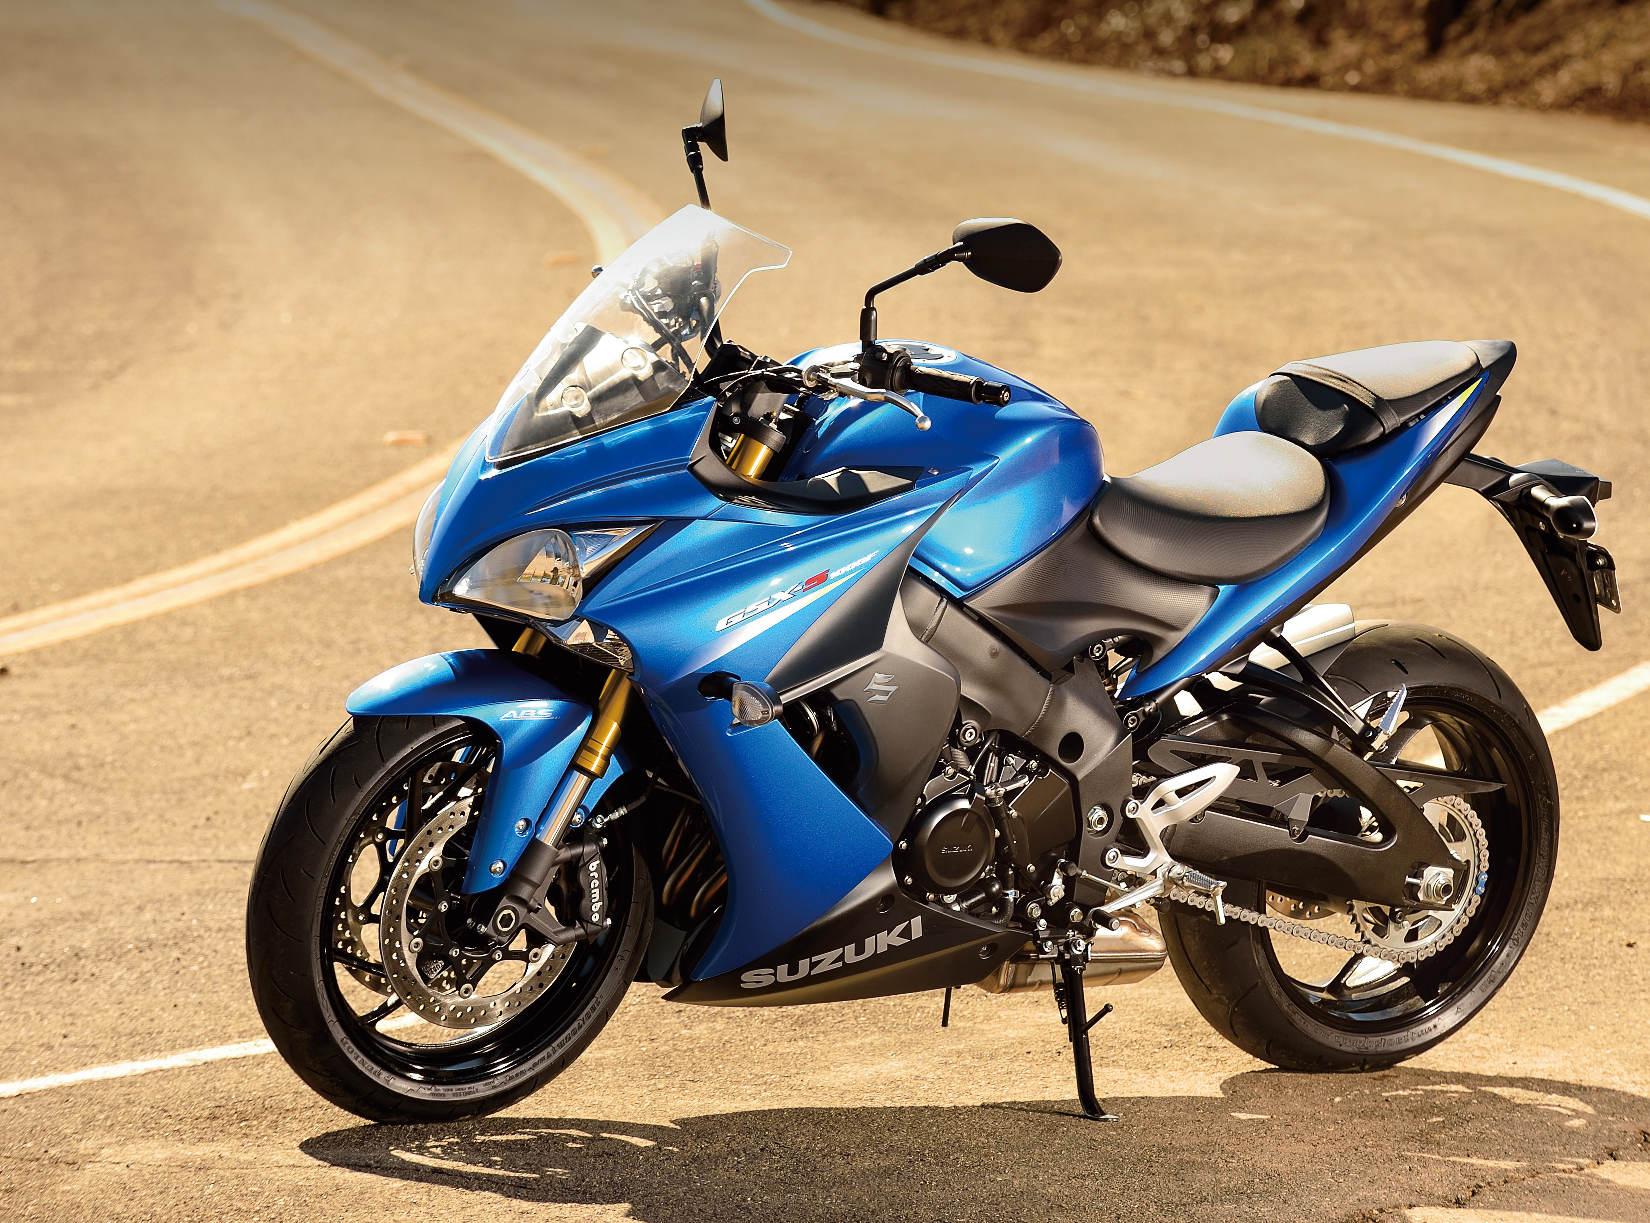 Por la Isla de Man con la nueva Suzuki GSX-S1000-F